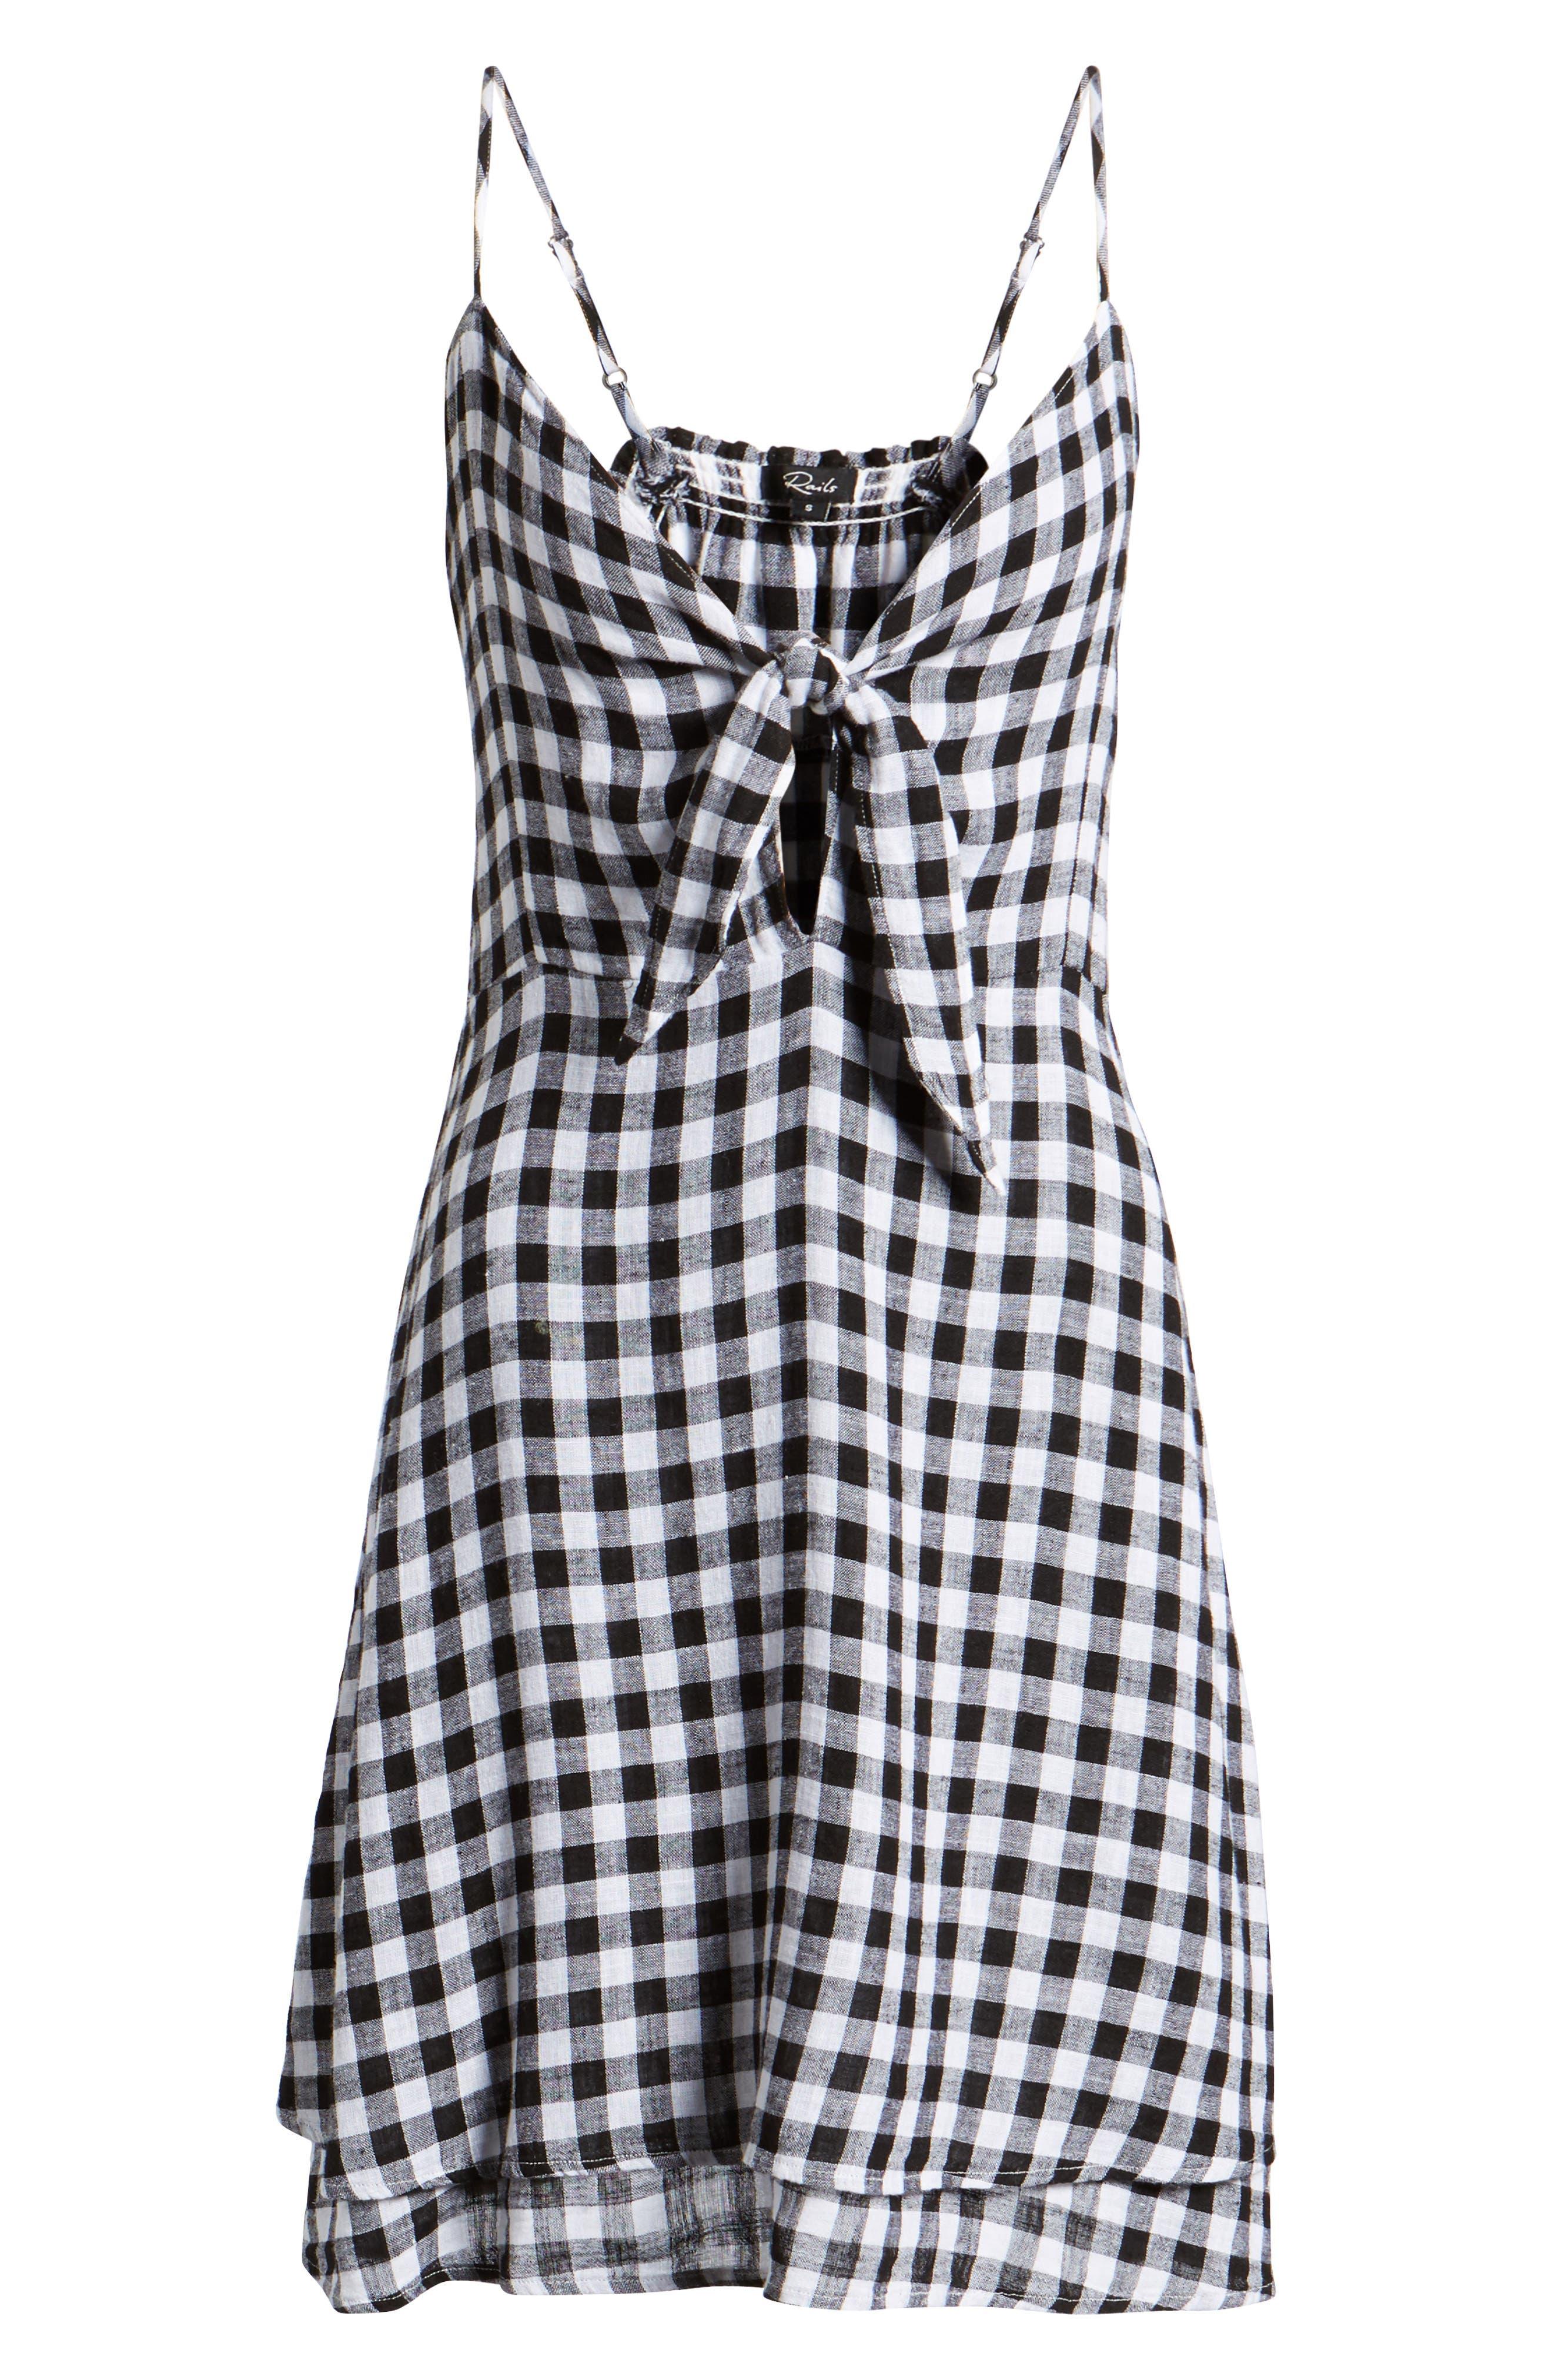 August Gingham Tie Front Dress,                             Alternate thumbnail 7, color,                             BLACK GINGHAM